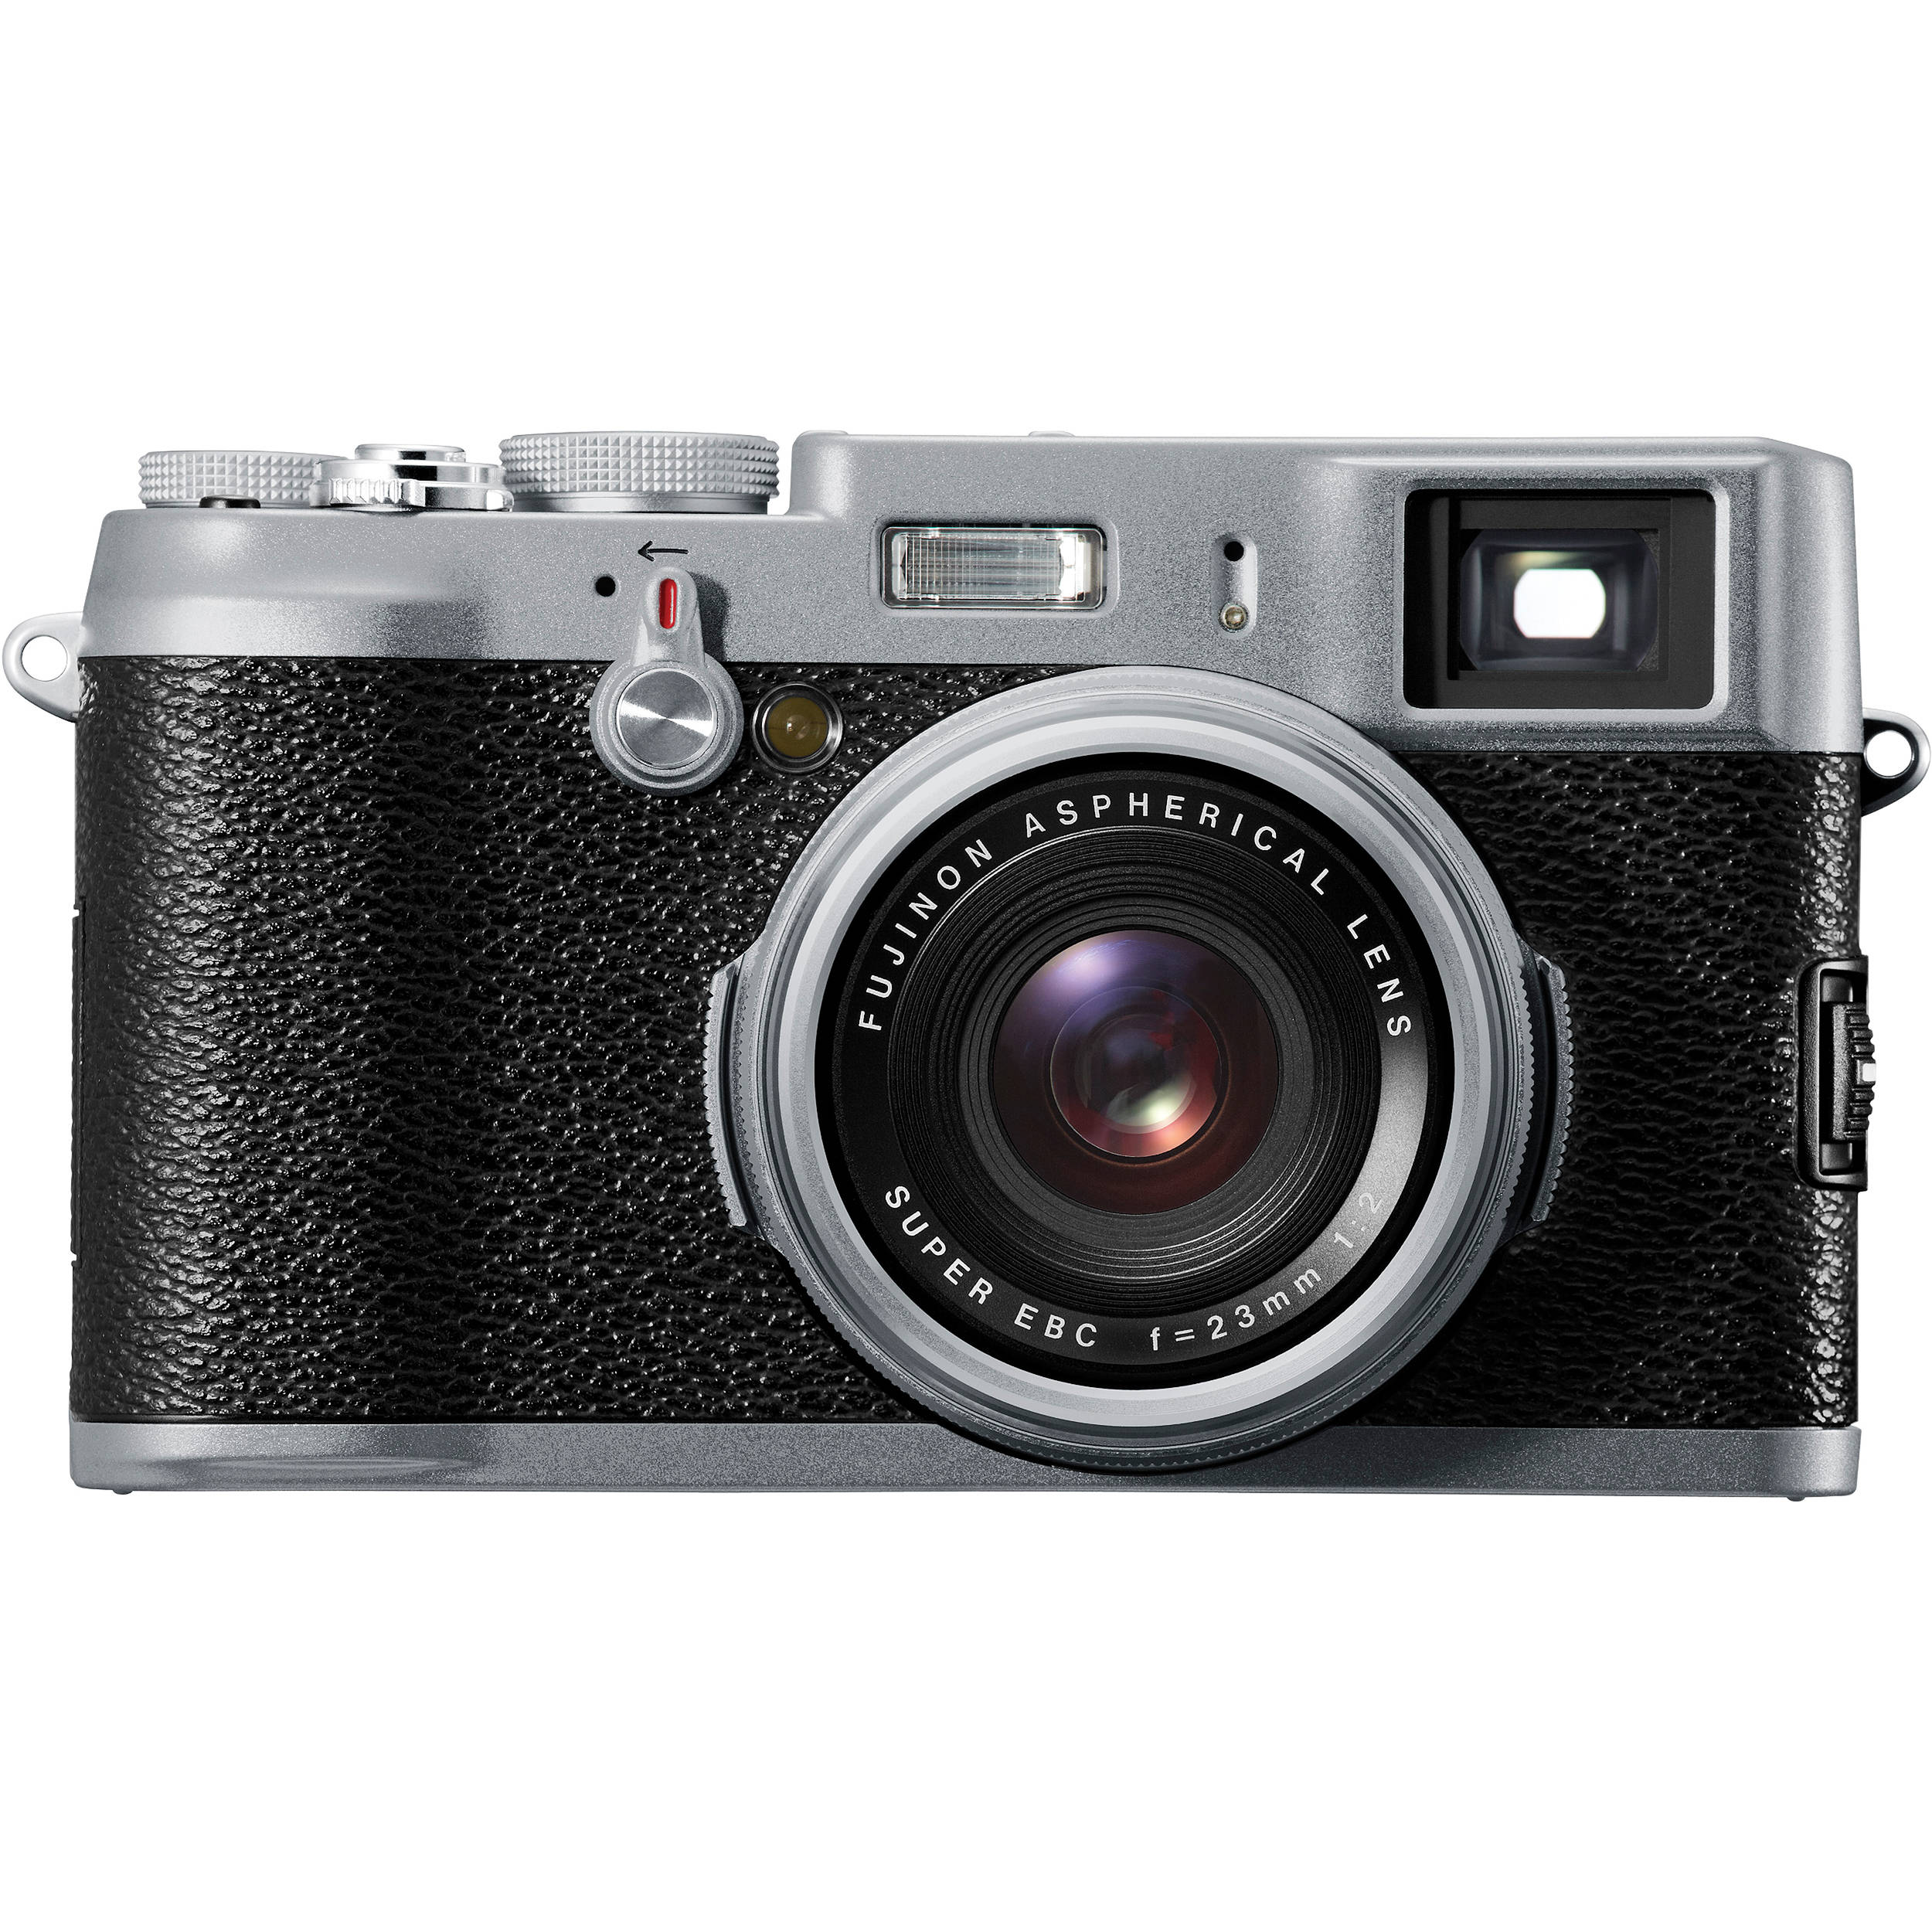 Fuji Digital Cameras: FUJIFILM FinePix X100 Digital Camera 16128244 B&H Photo Video